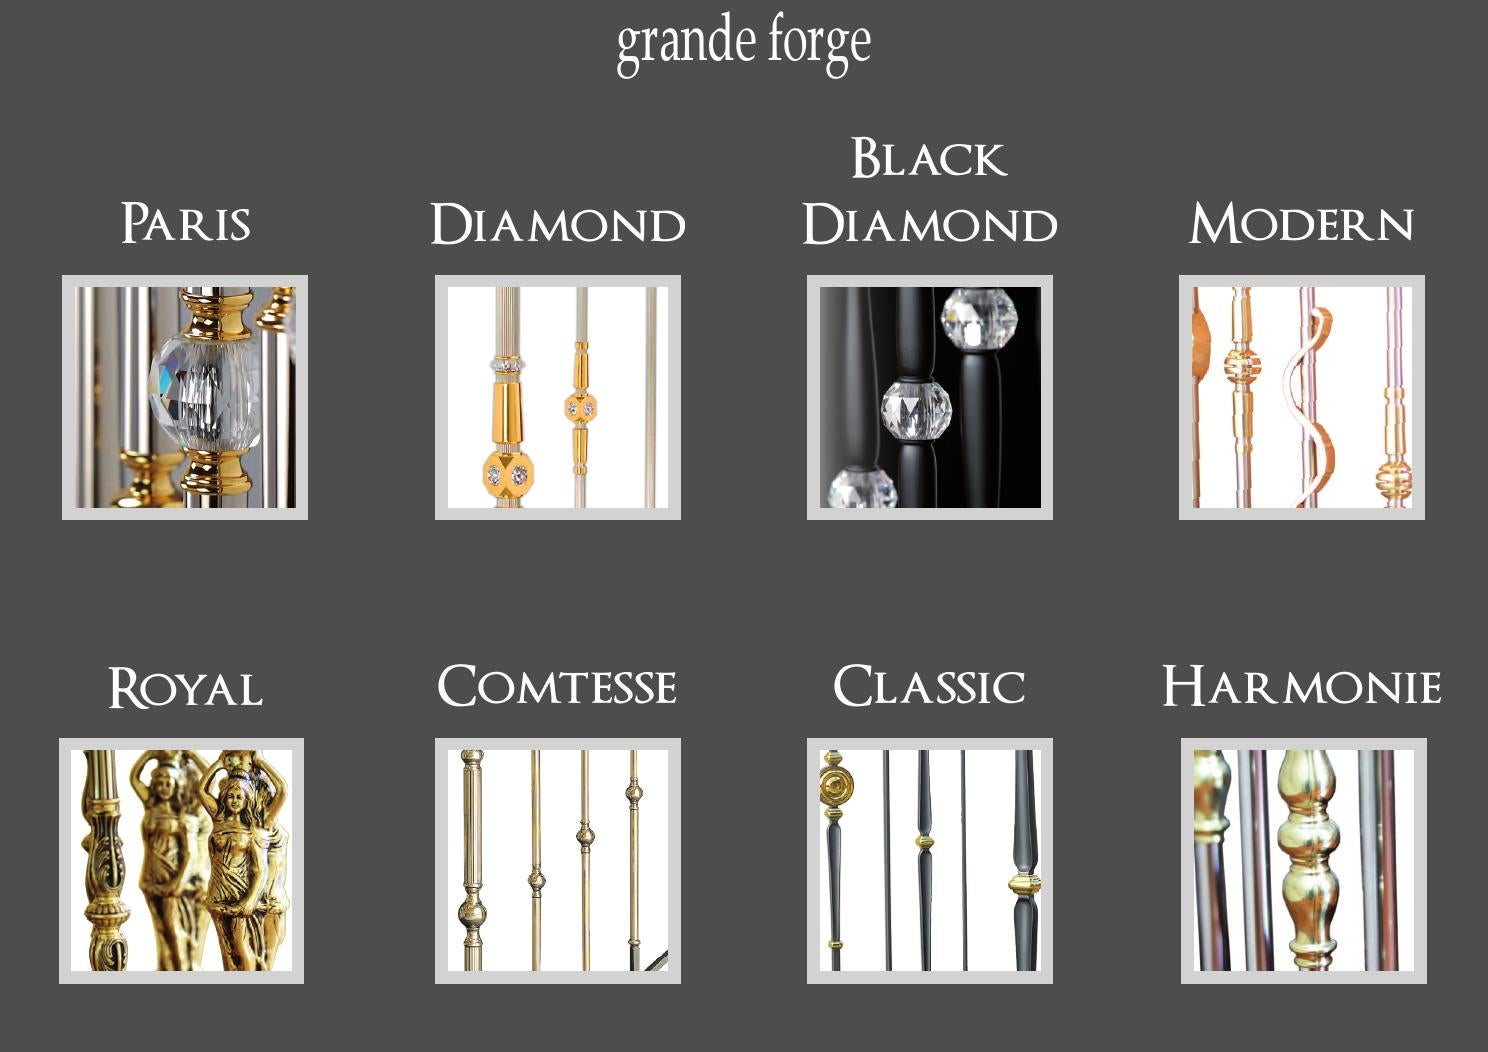 flipbook site internet jumpu 241214 by schutt grande forge issuu. Black Bedroom Furniture Sets. Home Design Ideas